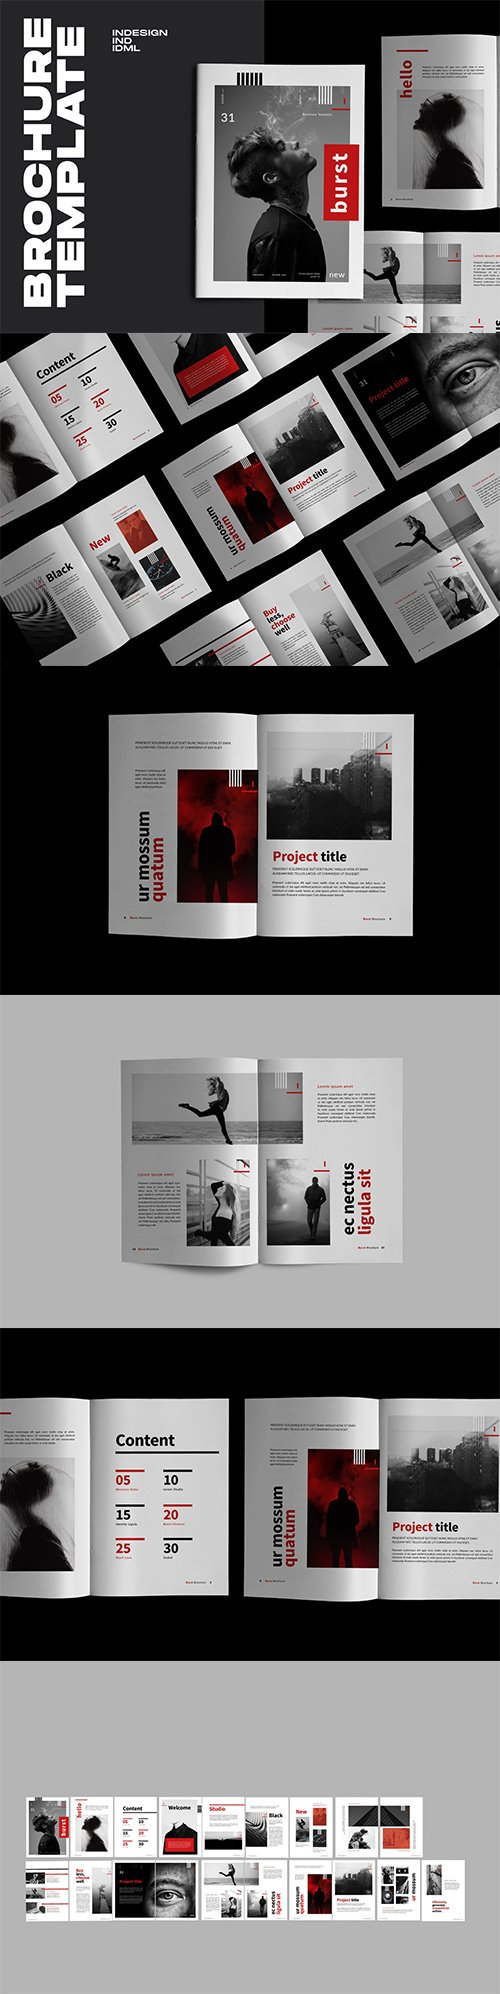 Burst - Urban Design Indesign Brochure